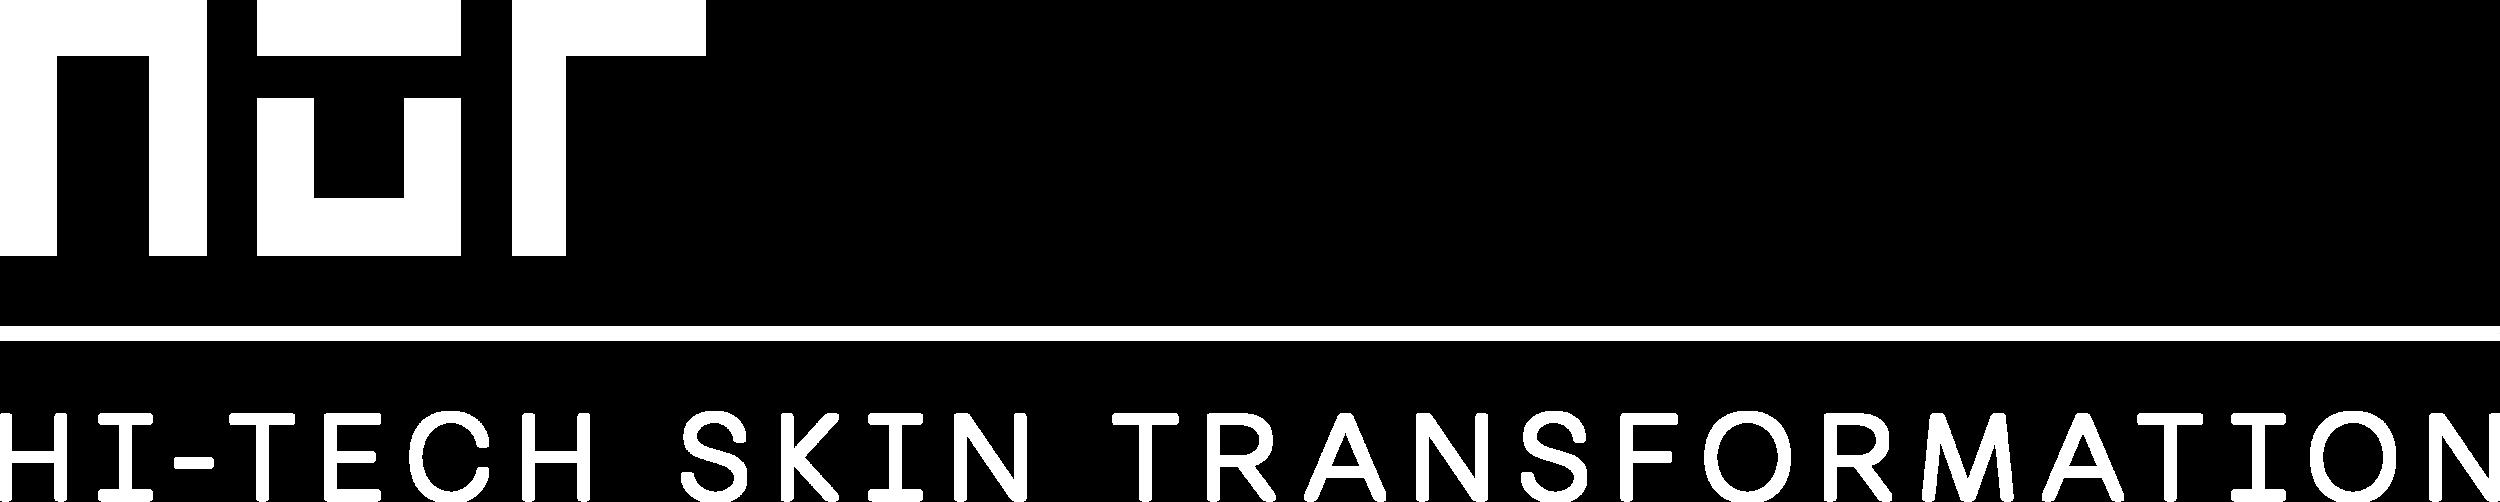 nur_white logo_no star_offset.png